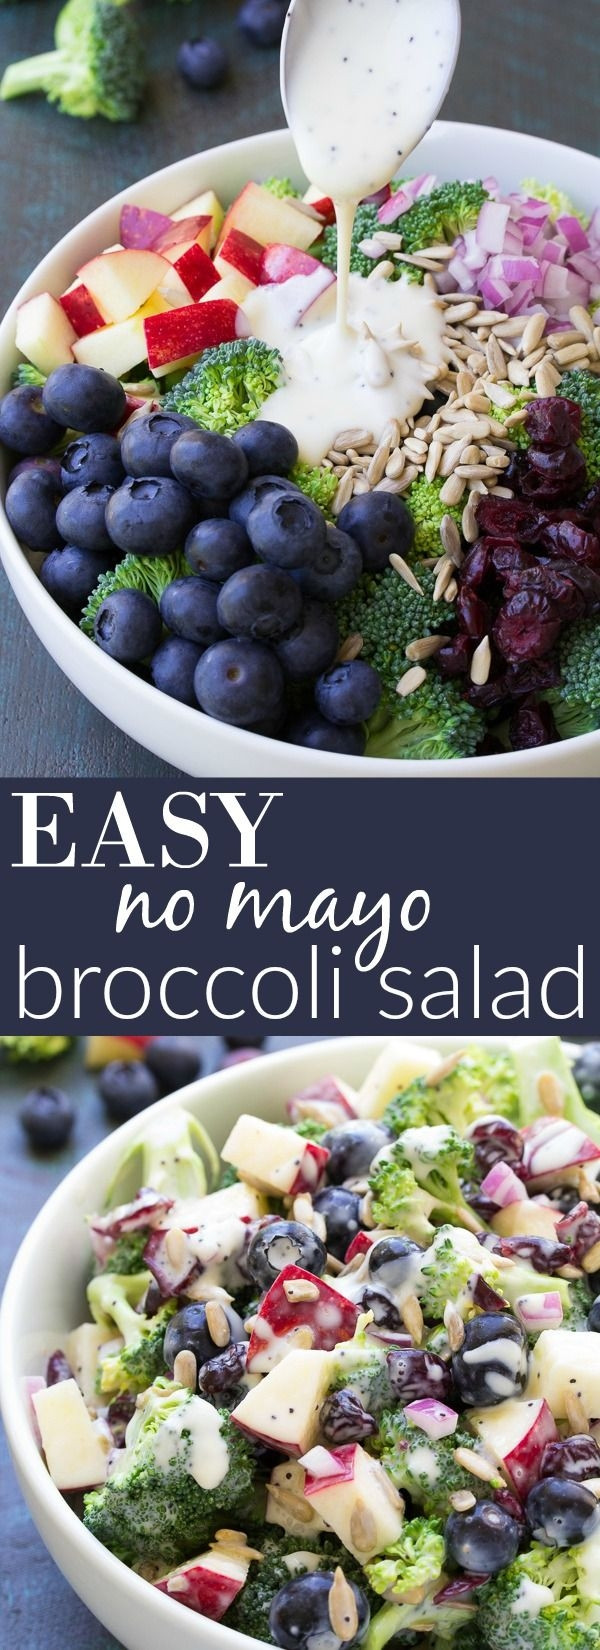 Broccoli Salad No Mayo  Best Ever No Mayo Broccoli Salad with Blueberries and